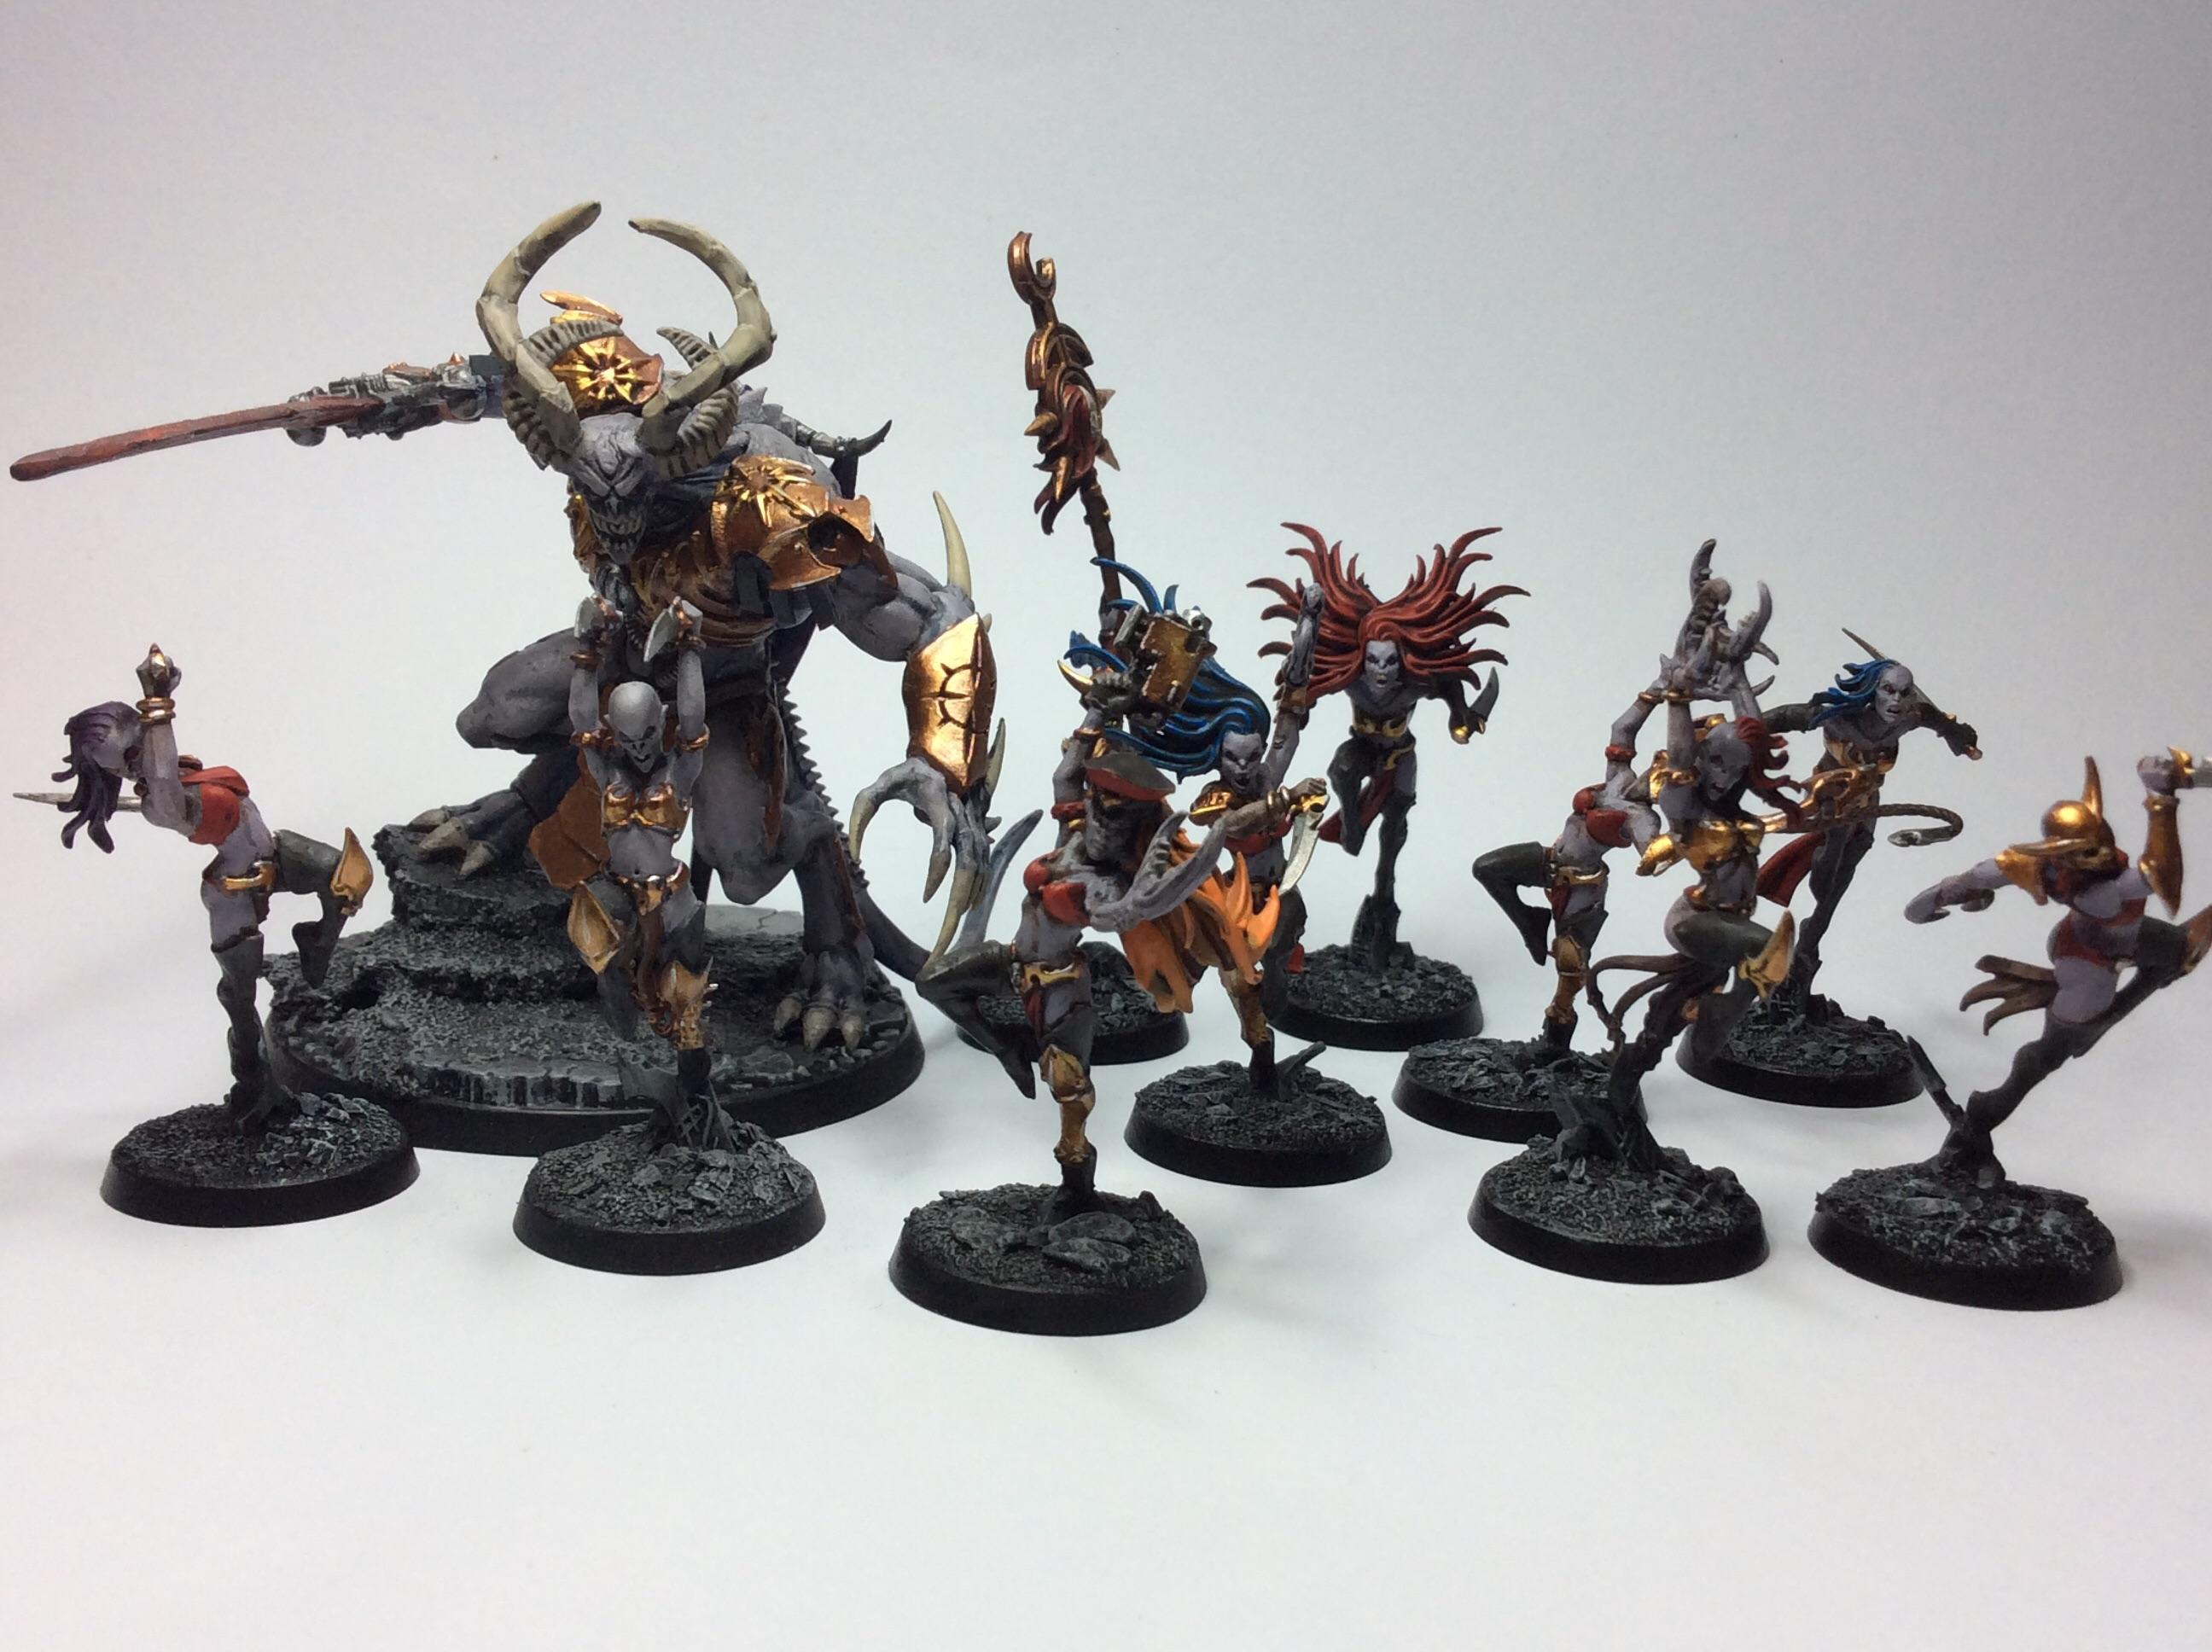 Bits hosts of slaanesh daemonettes of slaanesh chaos warhammer aos 40,000